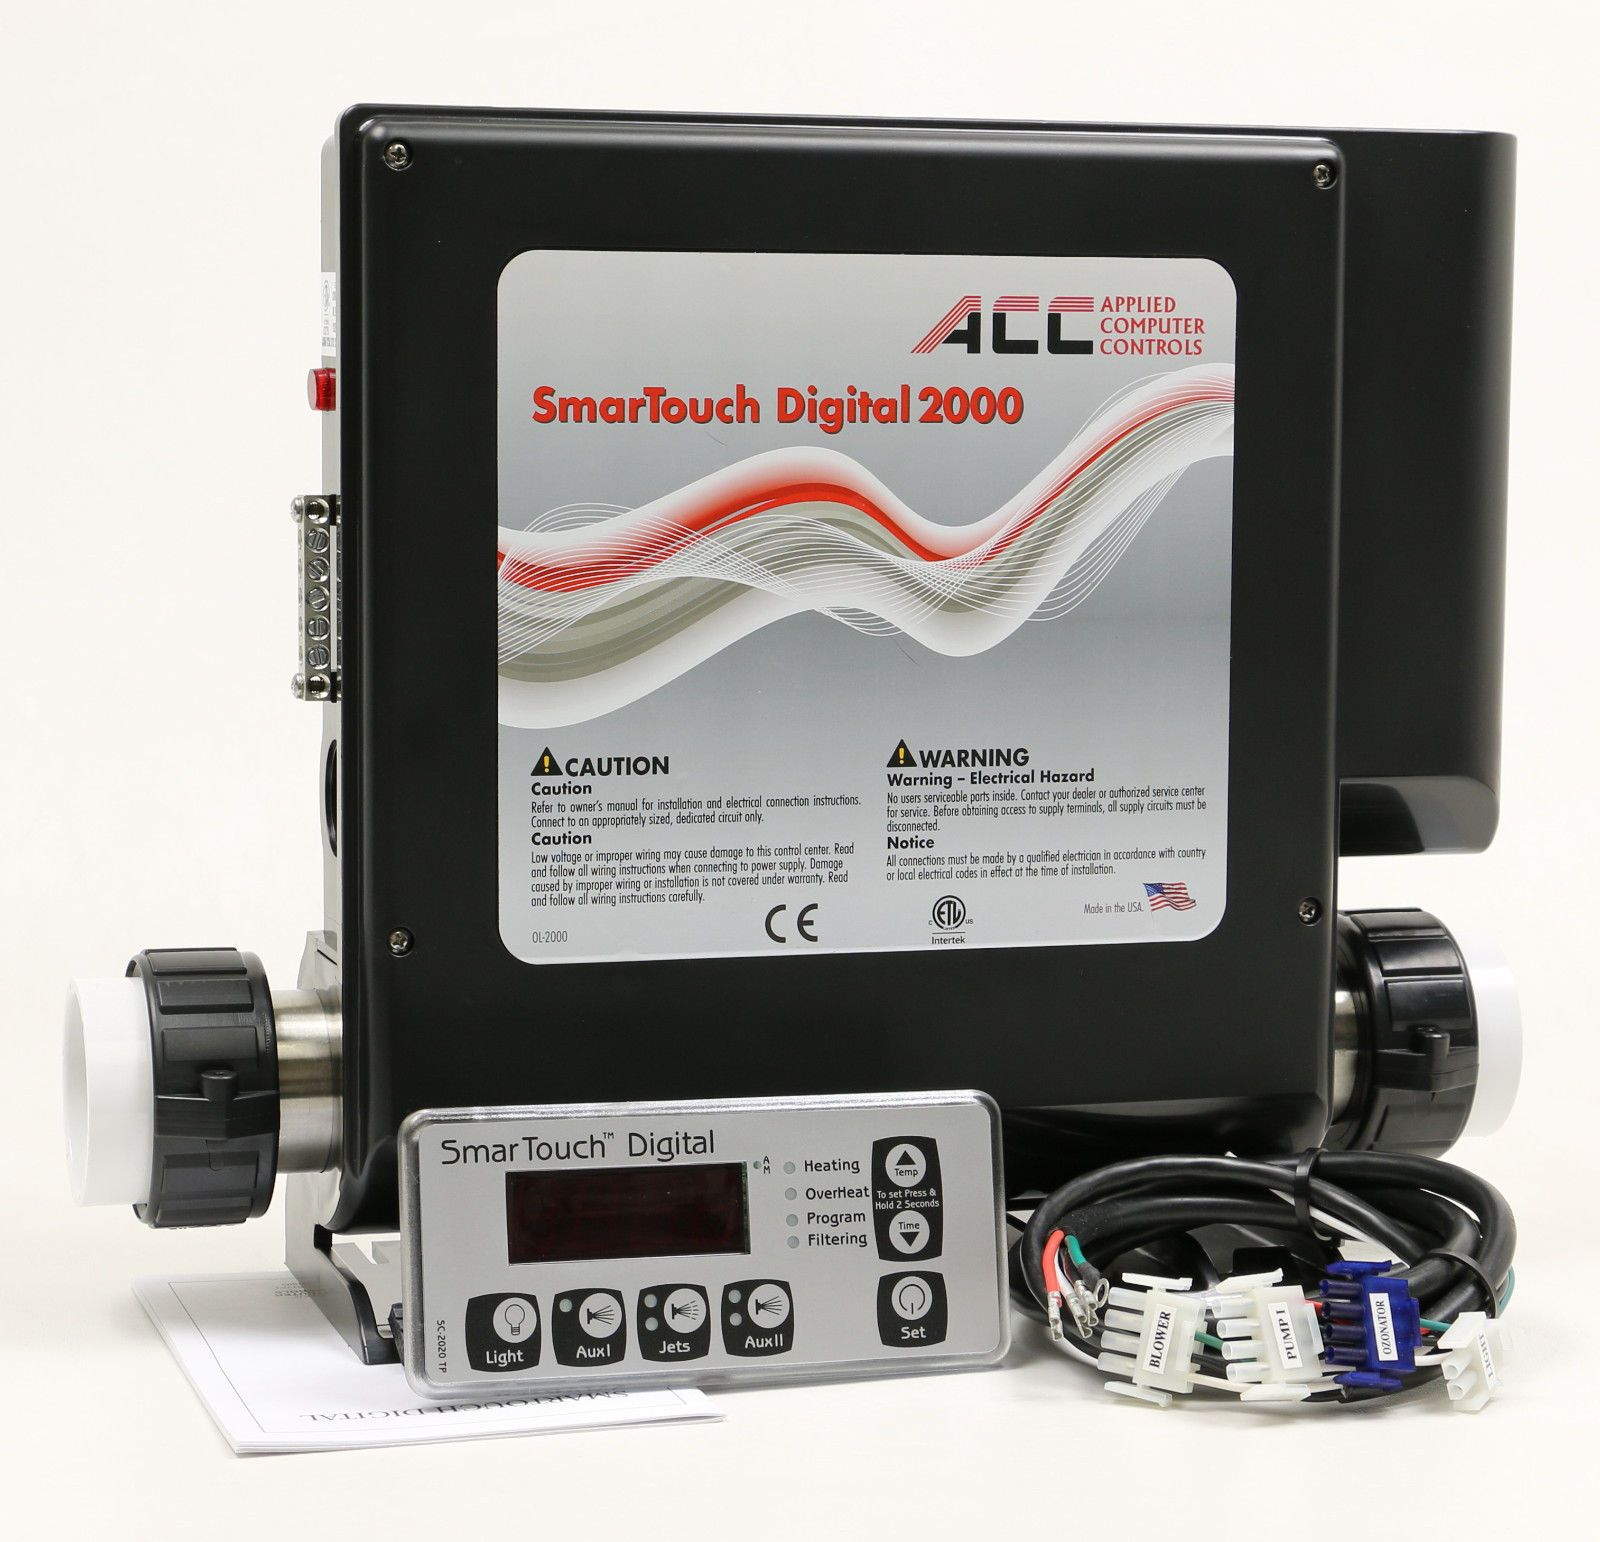 Hot Tub Heater Control Digital Spa Controller Pack Smtd 2000 Acc